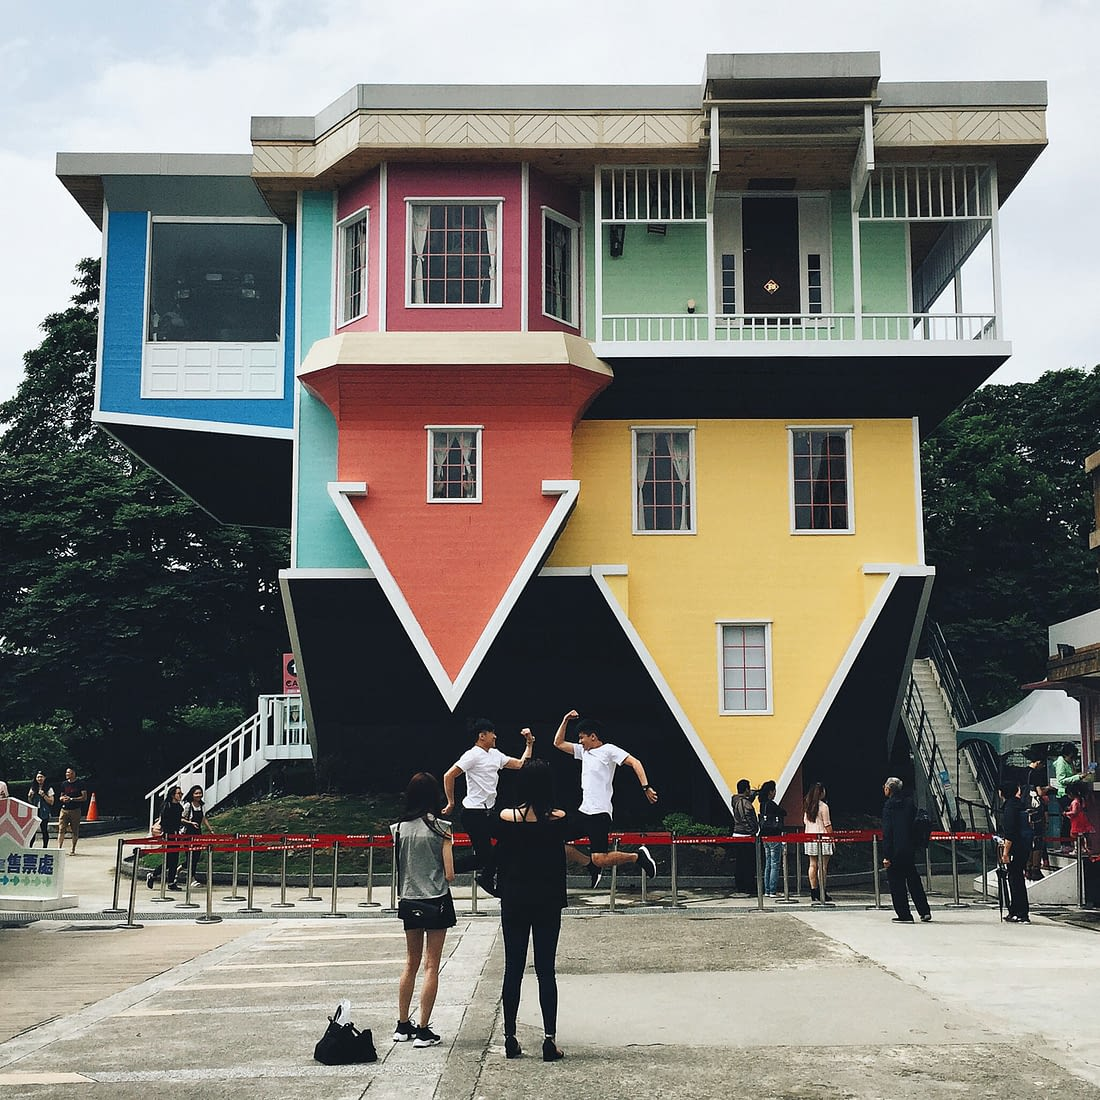 Taiwan - Huashan 1914 Creative Park - Upside down house